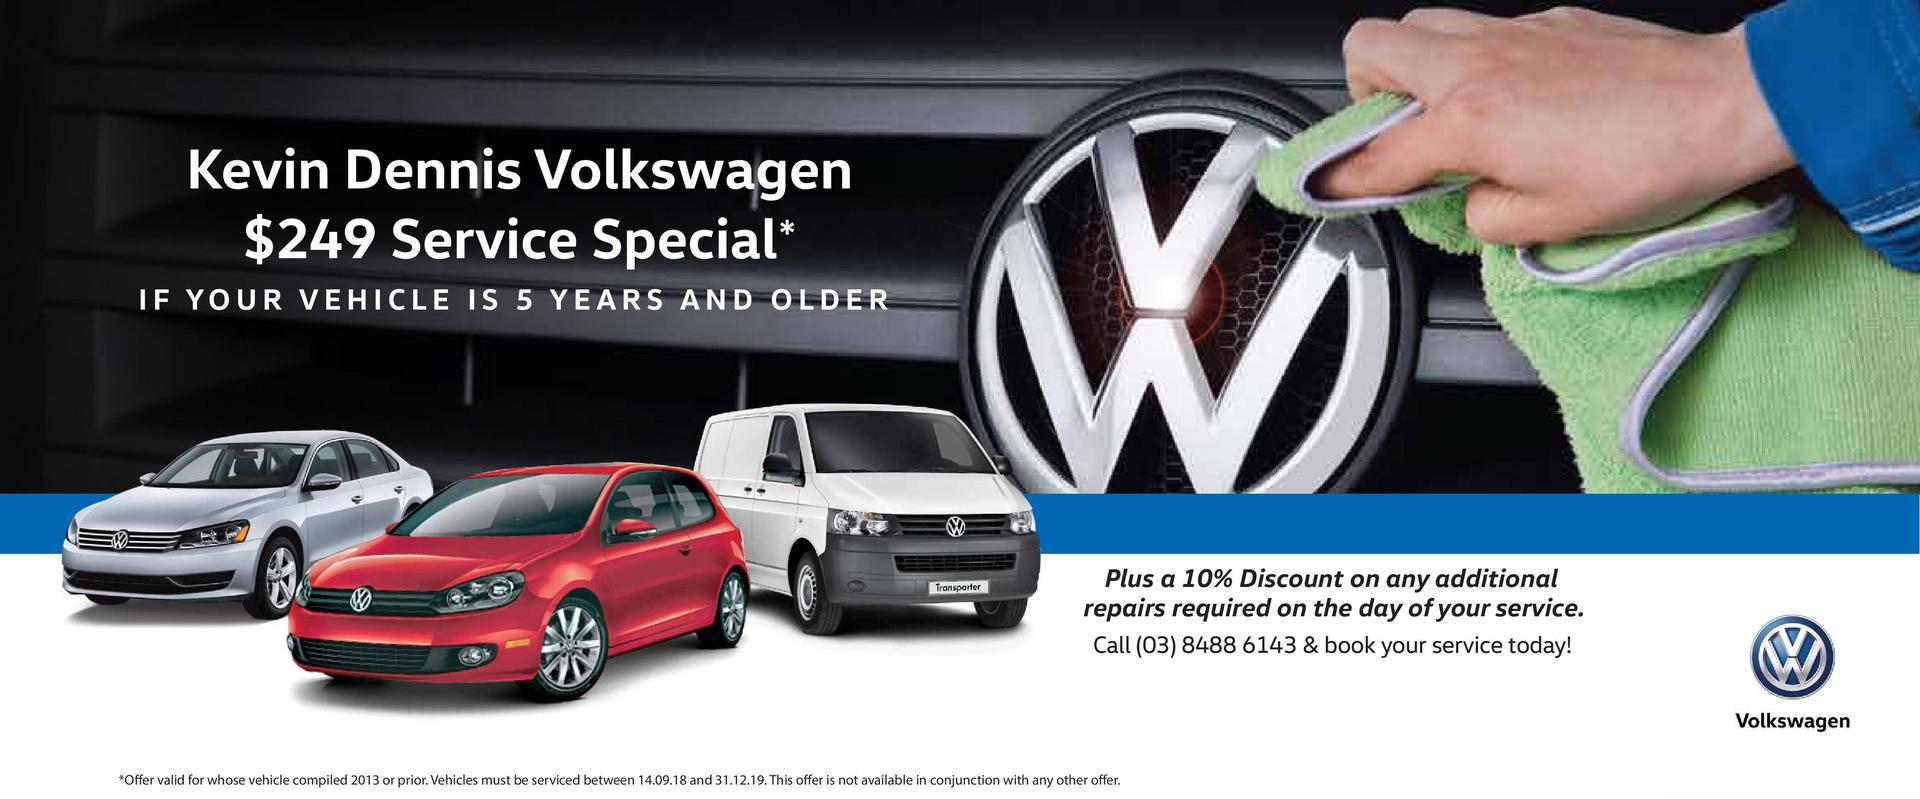 Kevin Dennis Volkswagen - $249 Service Special